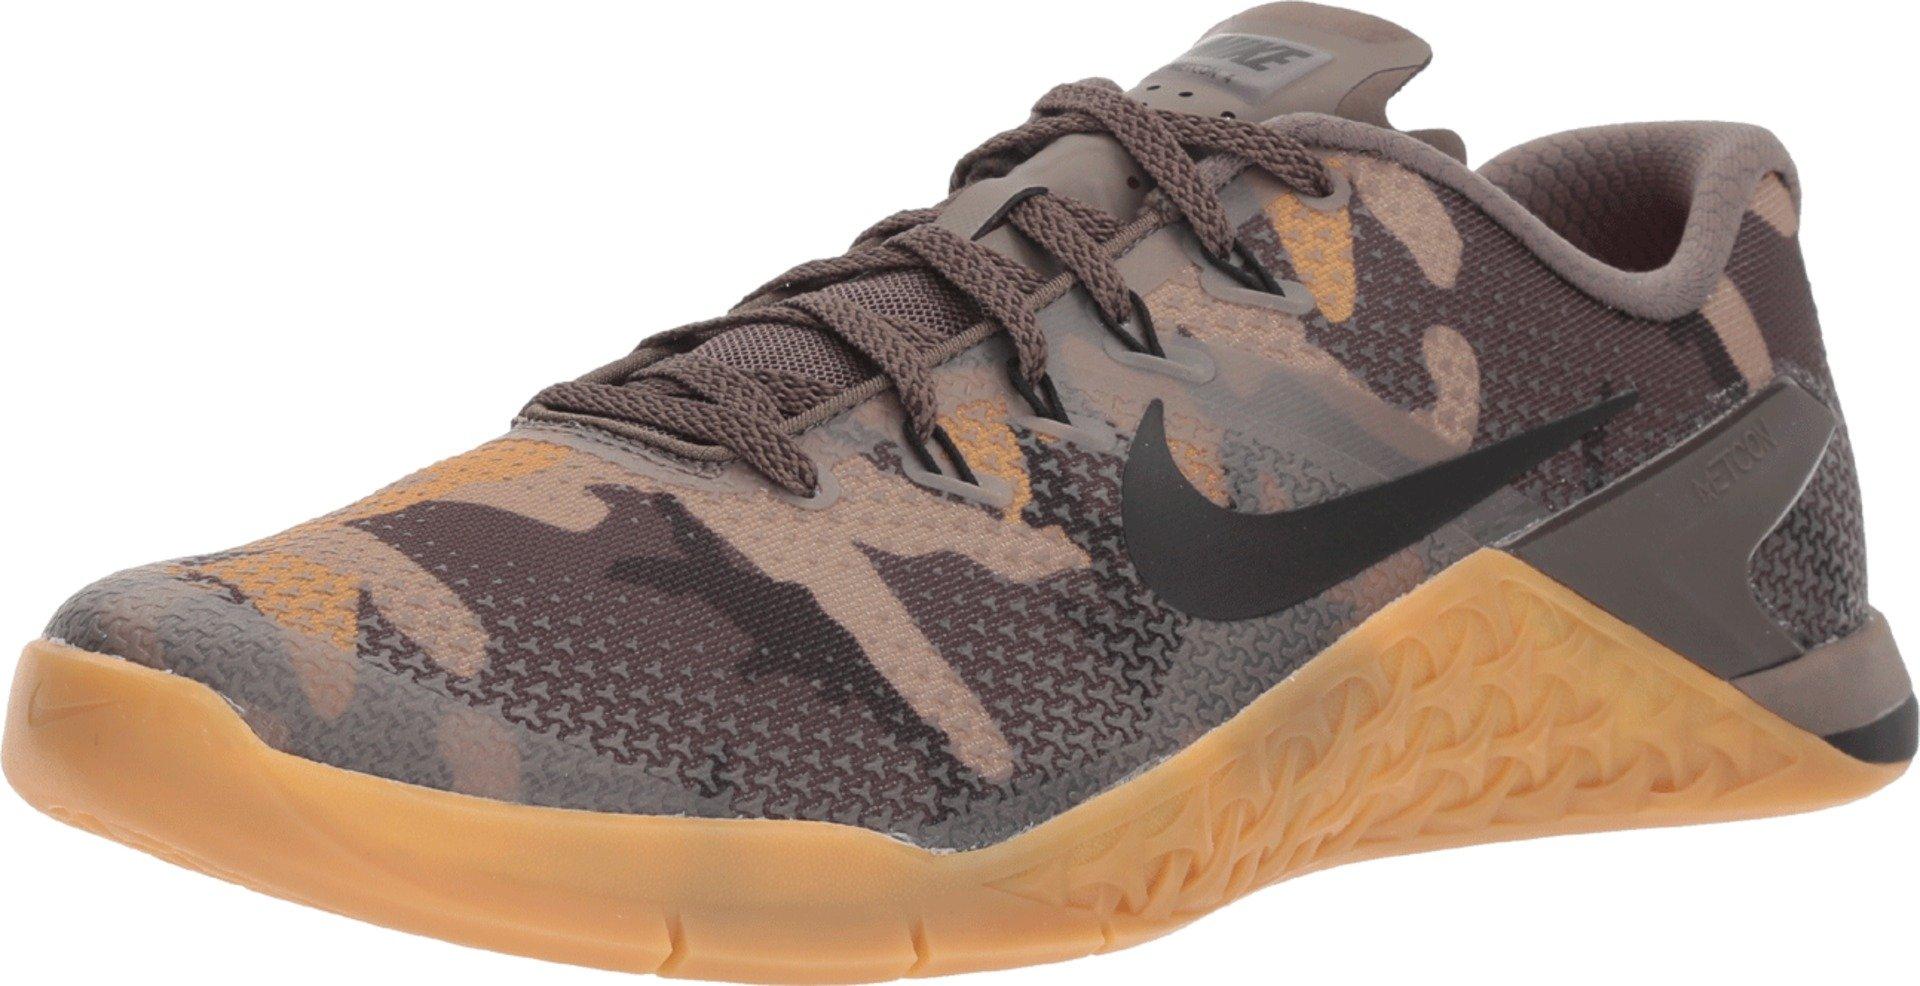 0743e8063e19 Galleon - Nike Men s Metcon 4 Camo Training Shoes (14